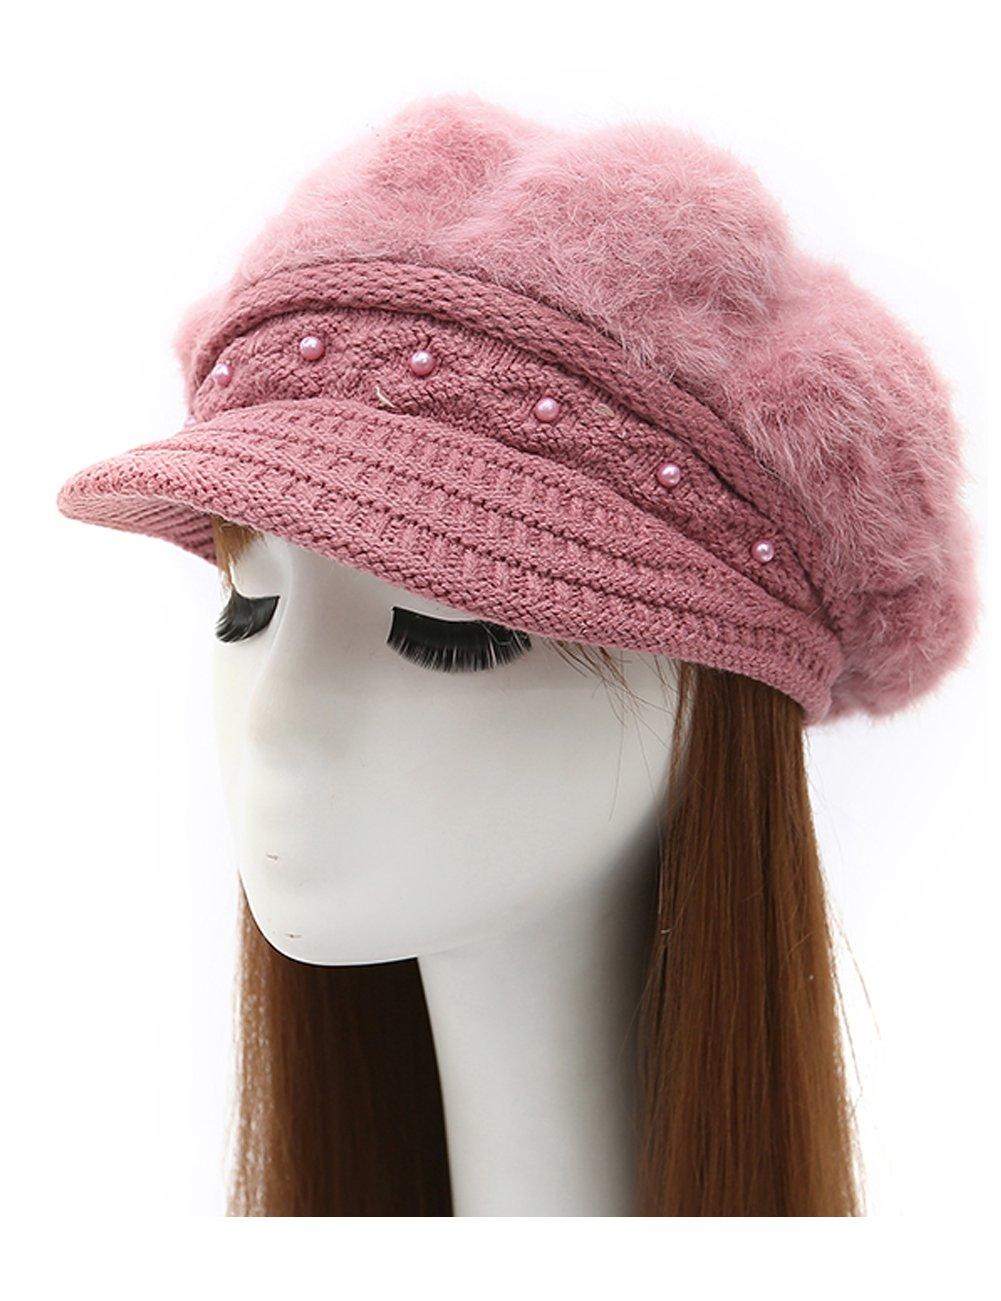 Epsion Women Winter Knit Crochet Newsboy Caps Lady Warm Pearl Knit Beanie Hat